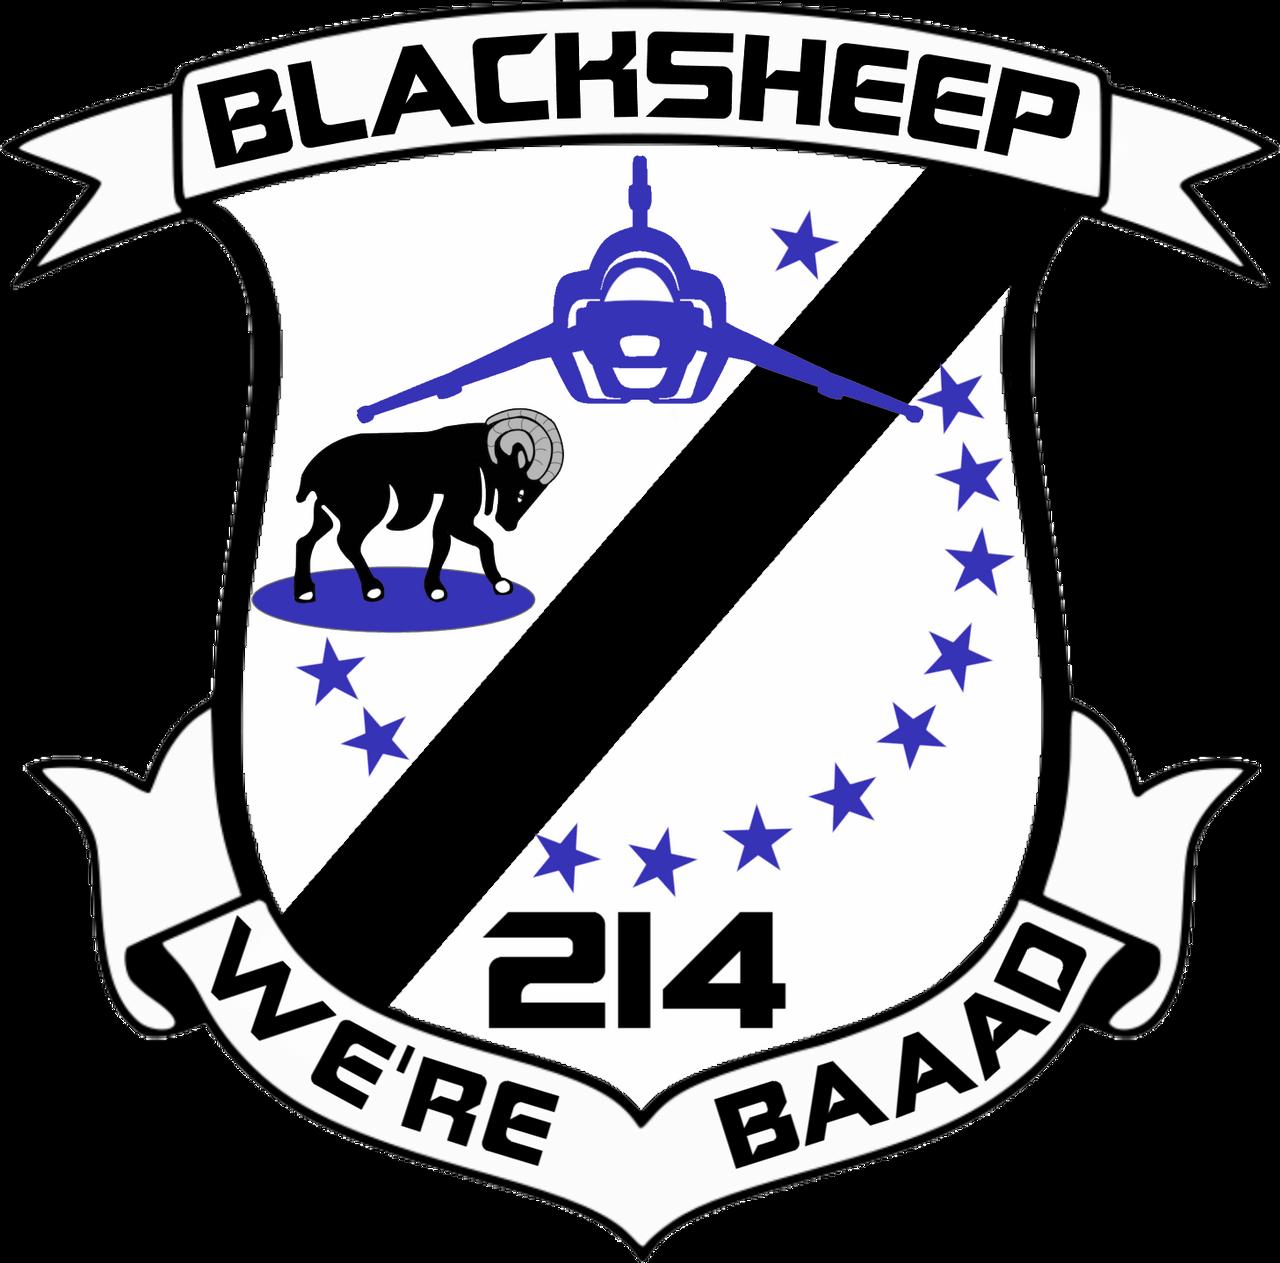 BSG VFS-214 Blaksheep Squadron Insignia by viperaviator on ...